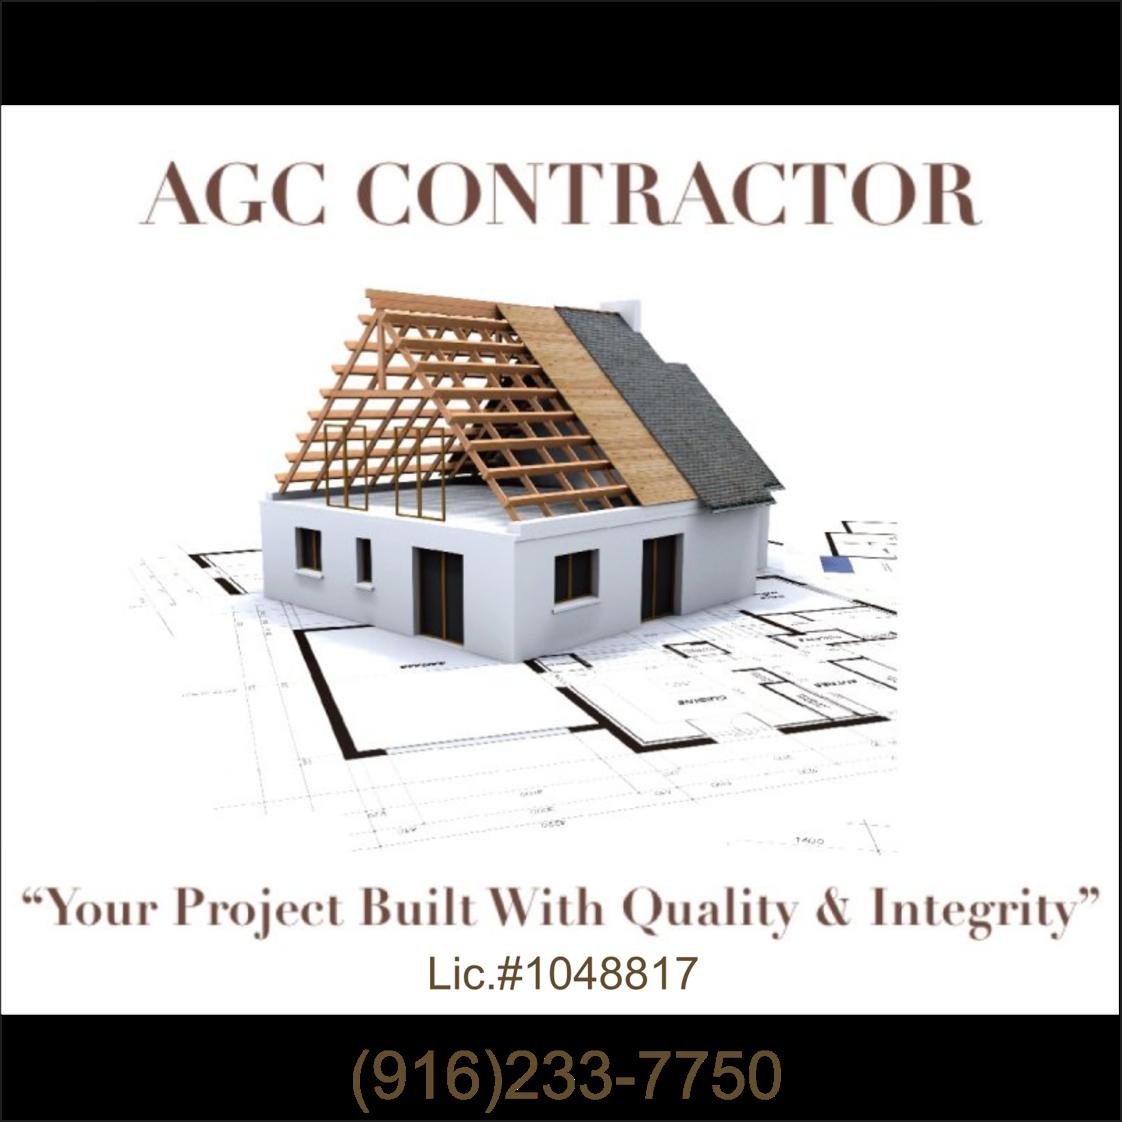 AGC Contractor